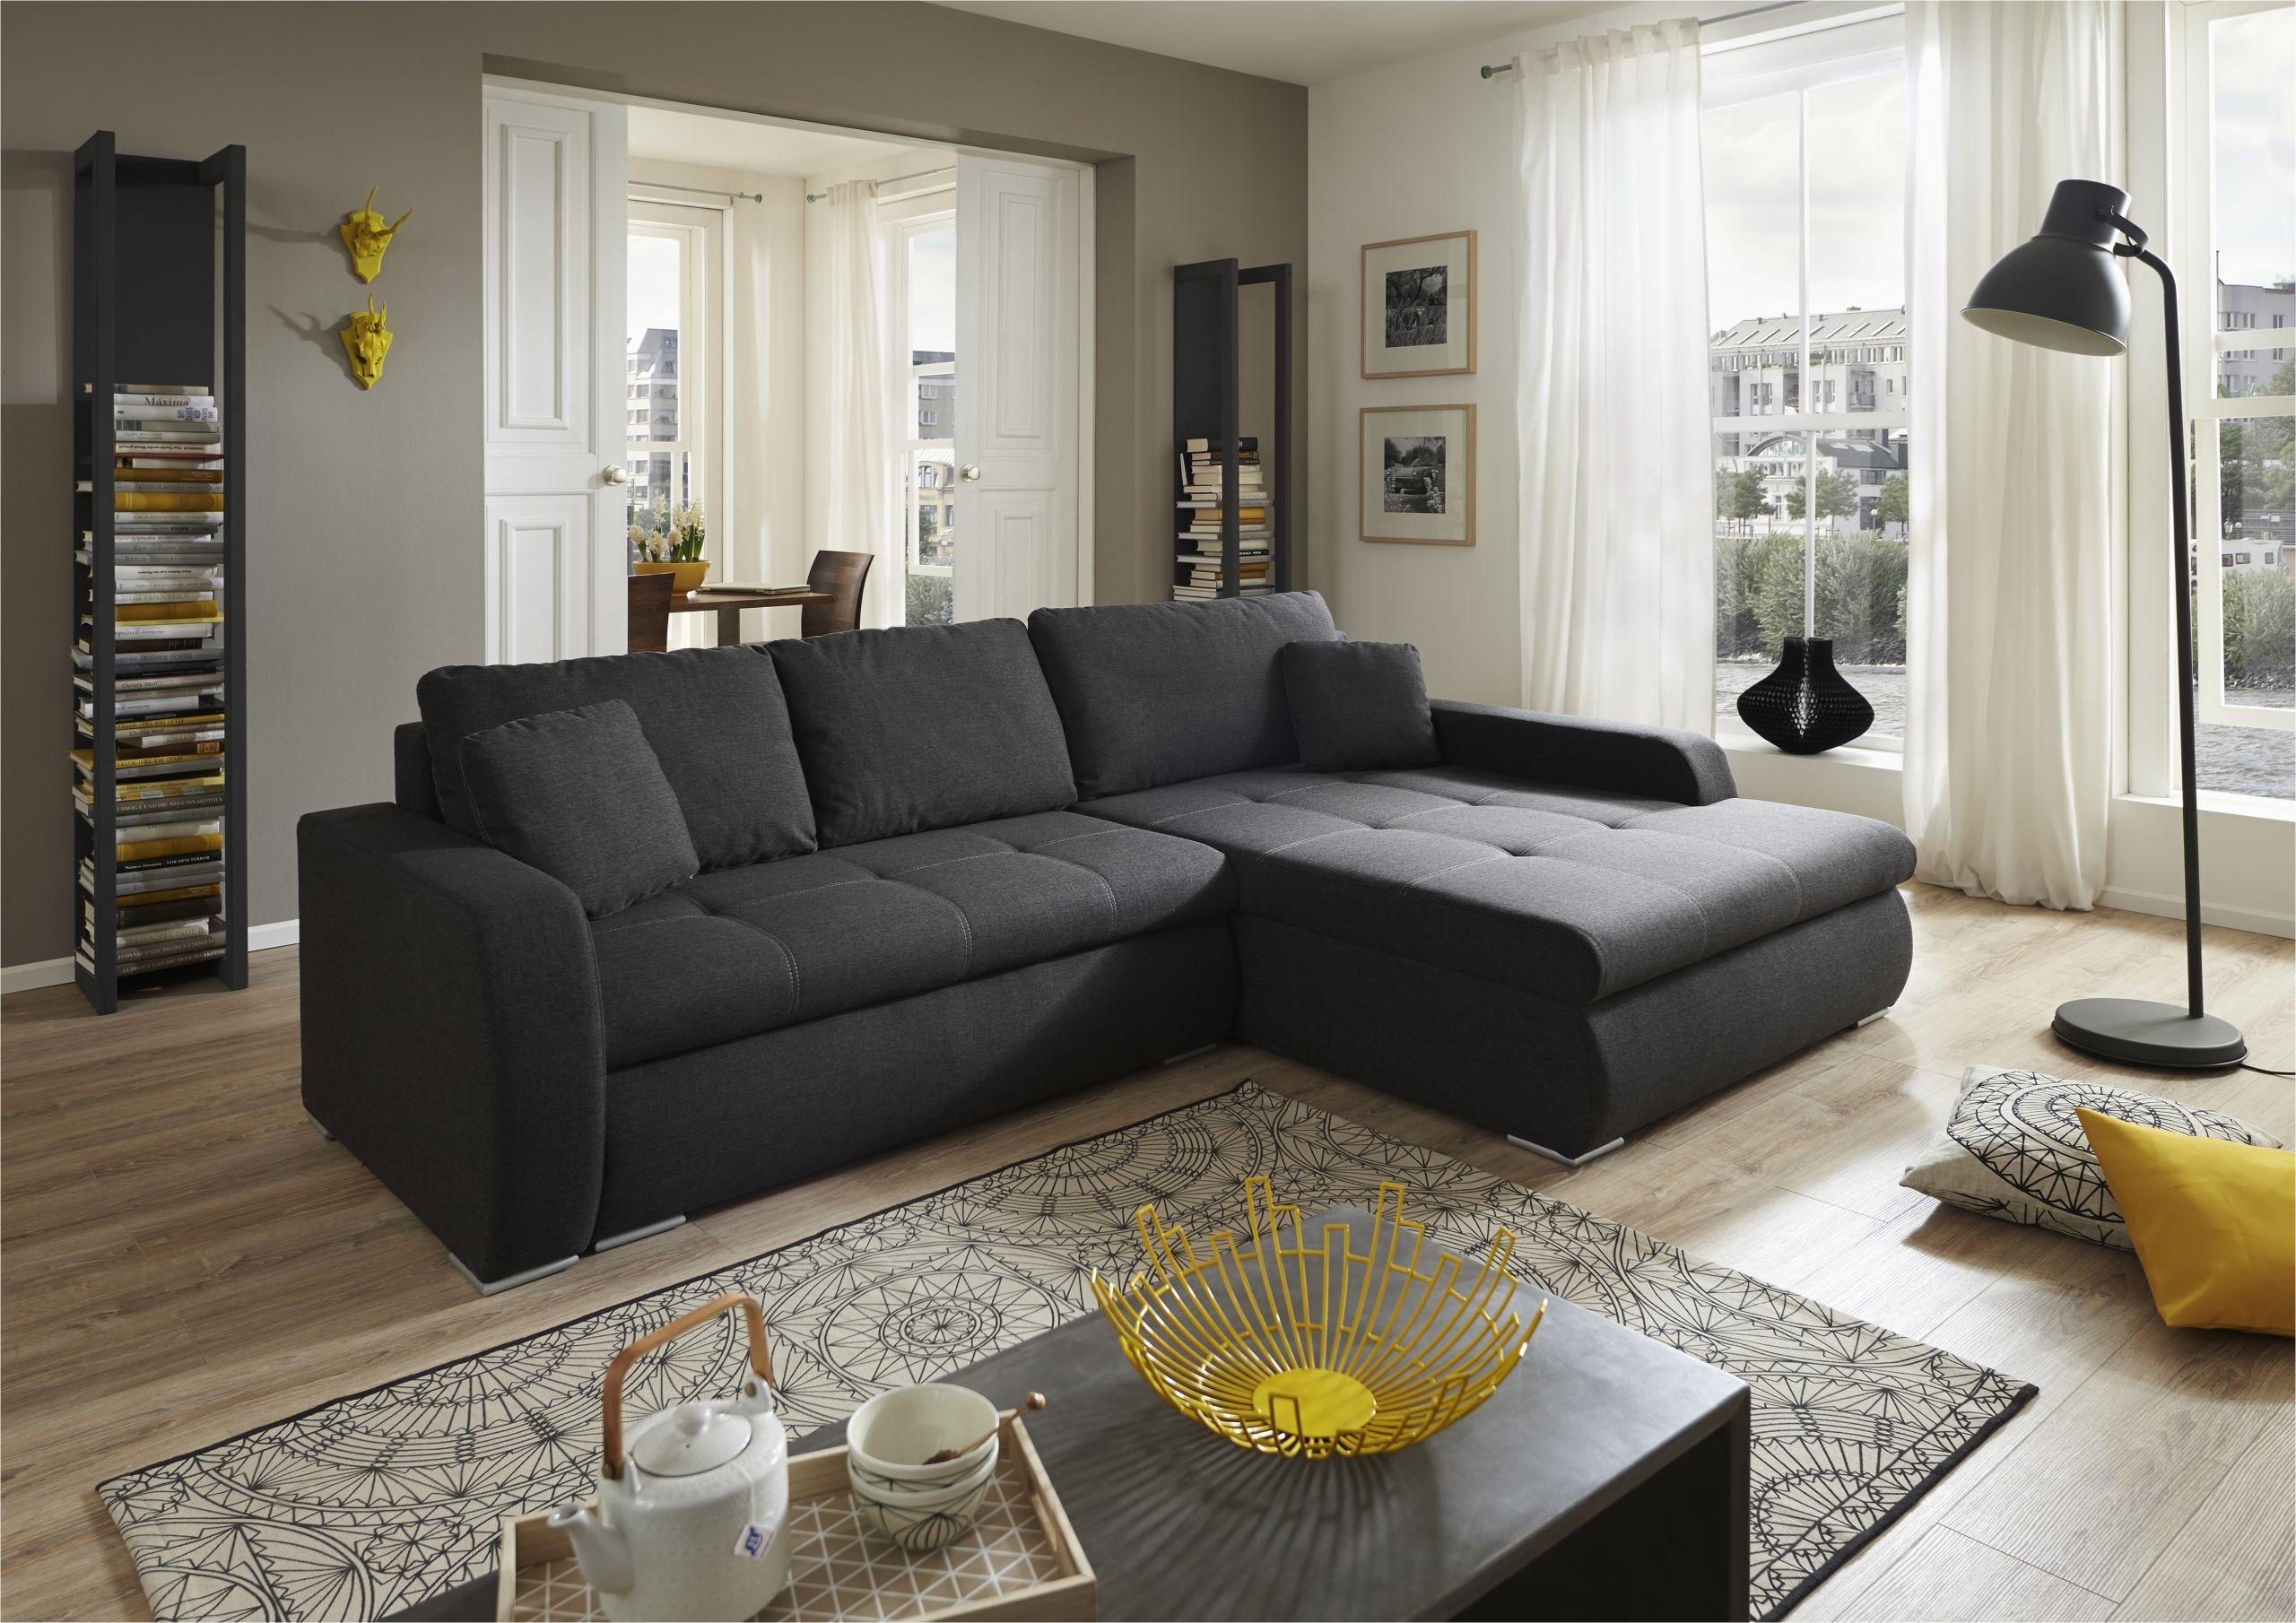 Sofa Design Ke New song Funktionsecke